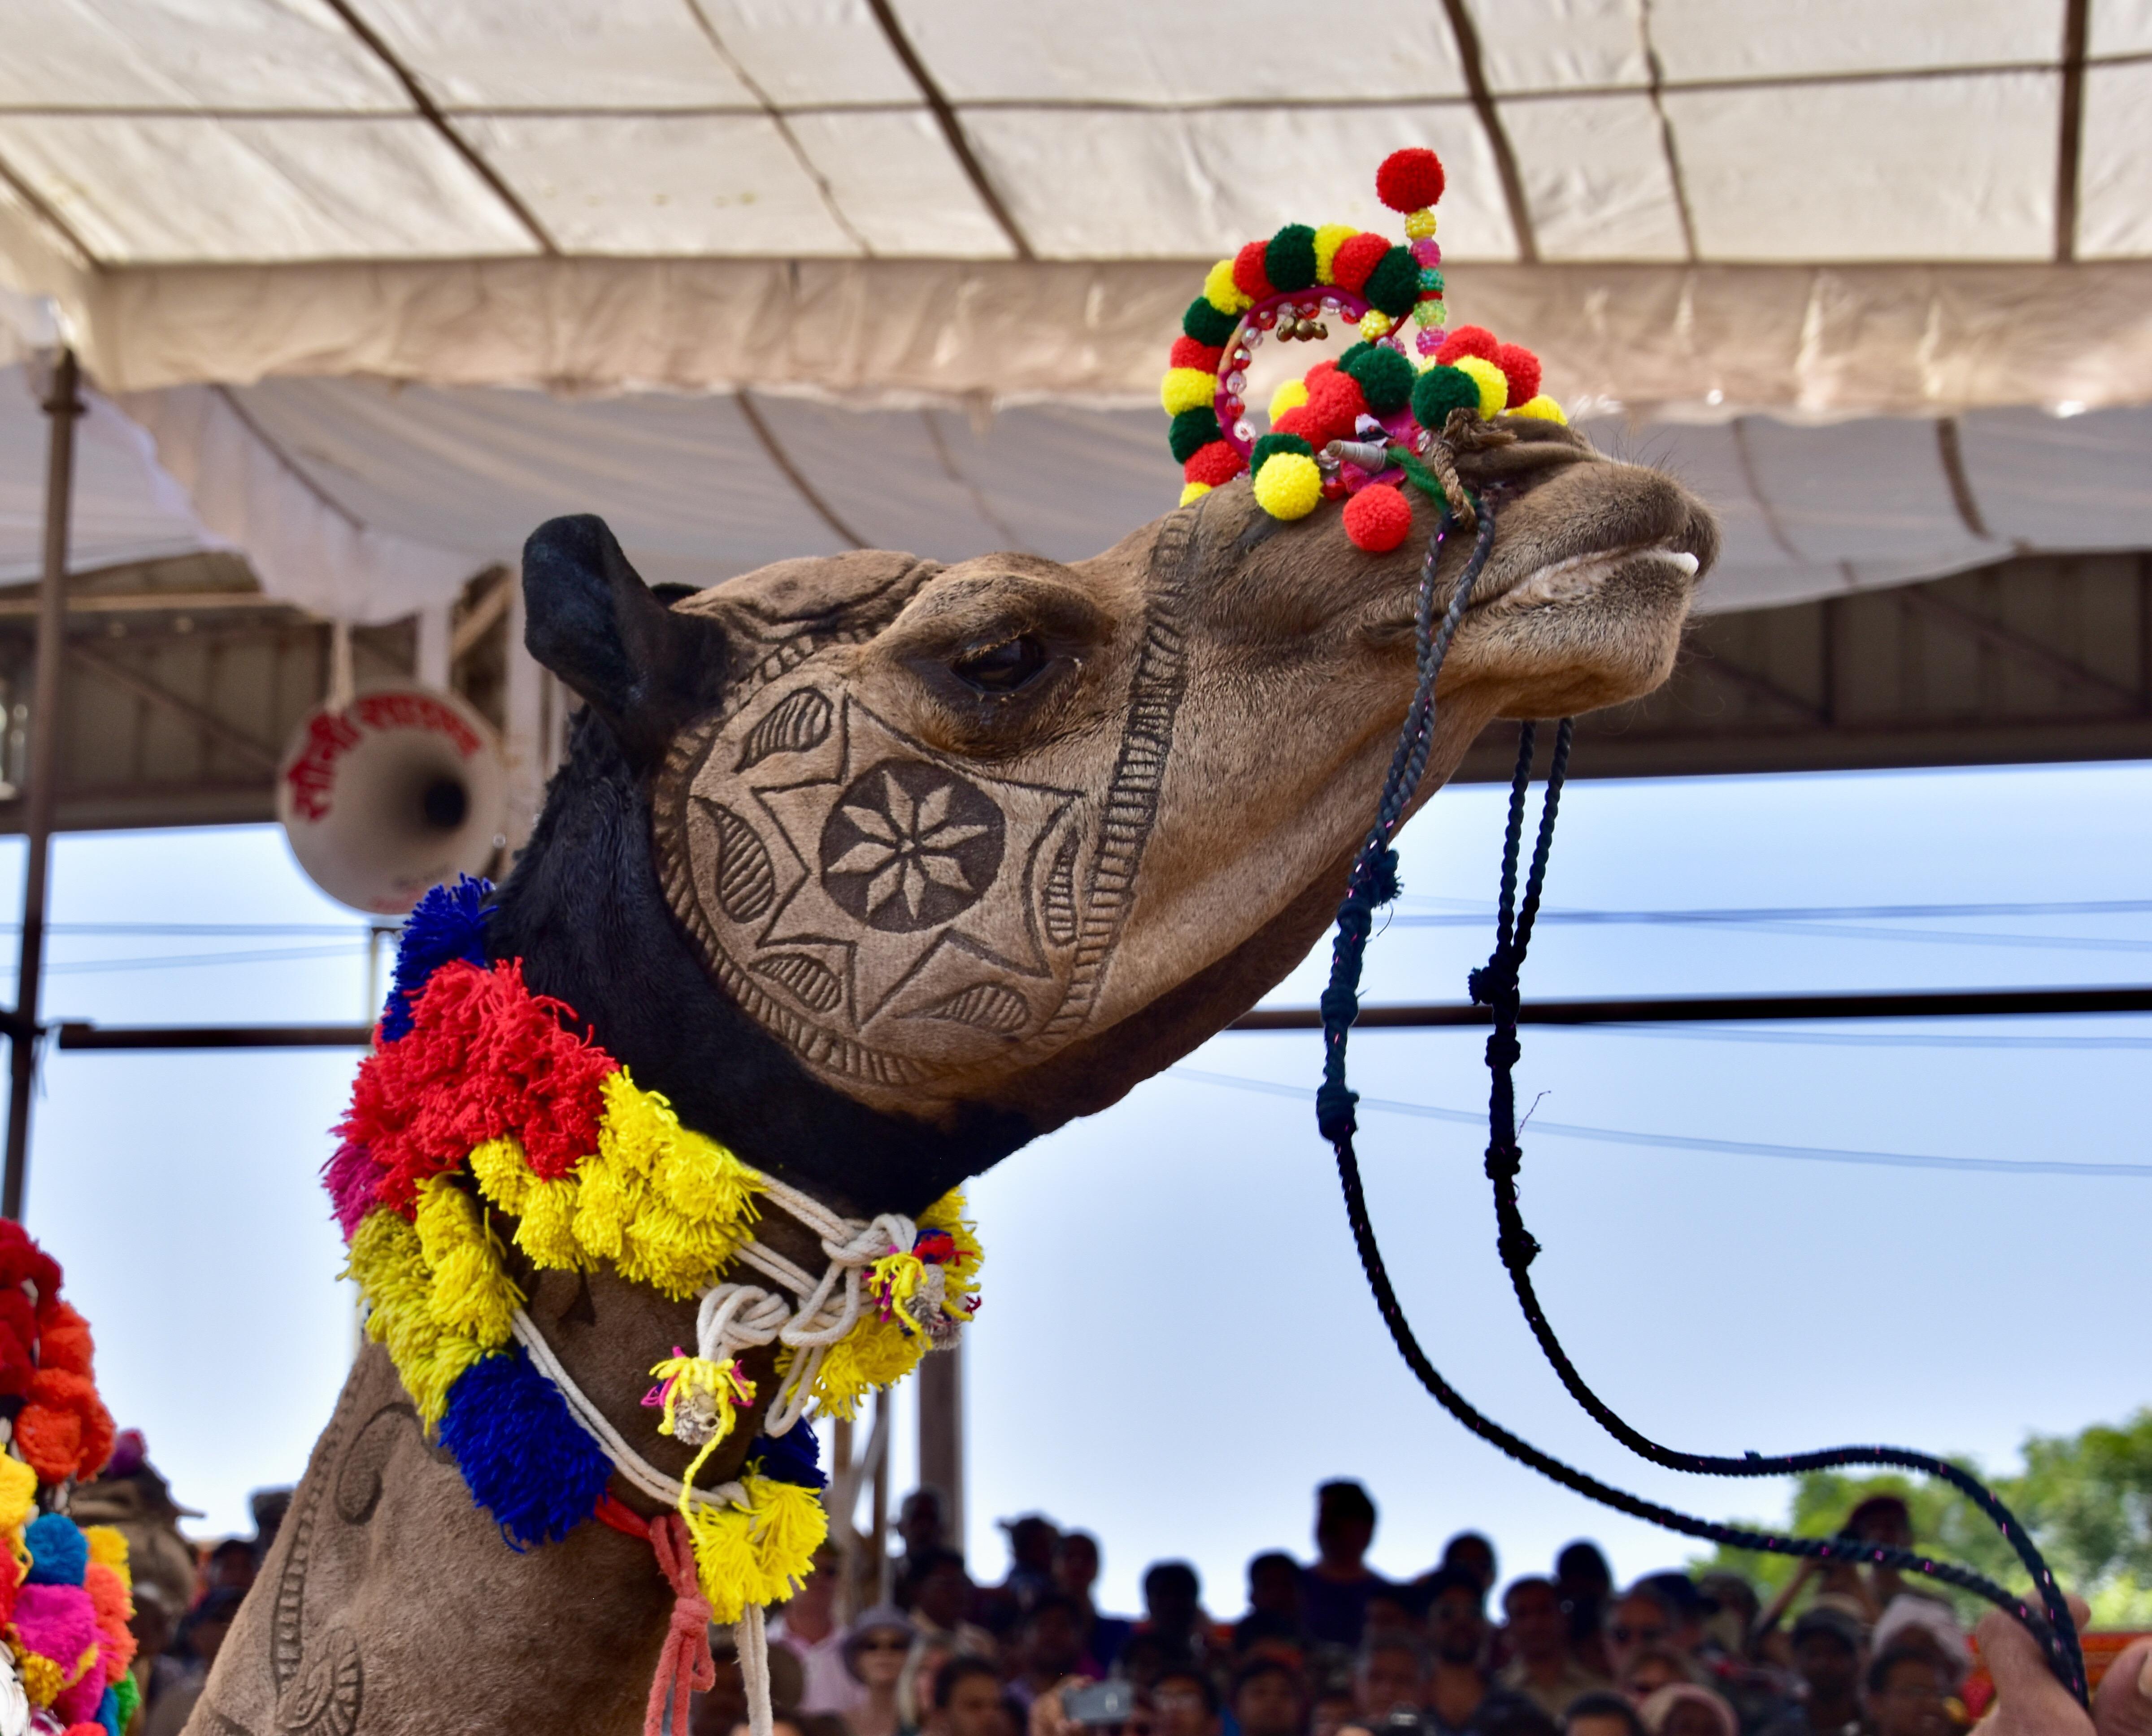 Camel Mc Camelface